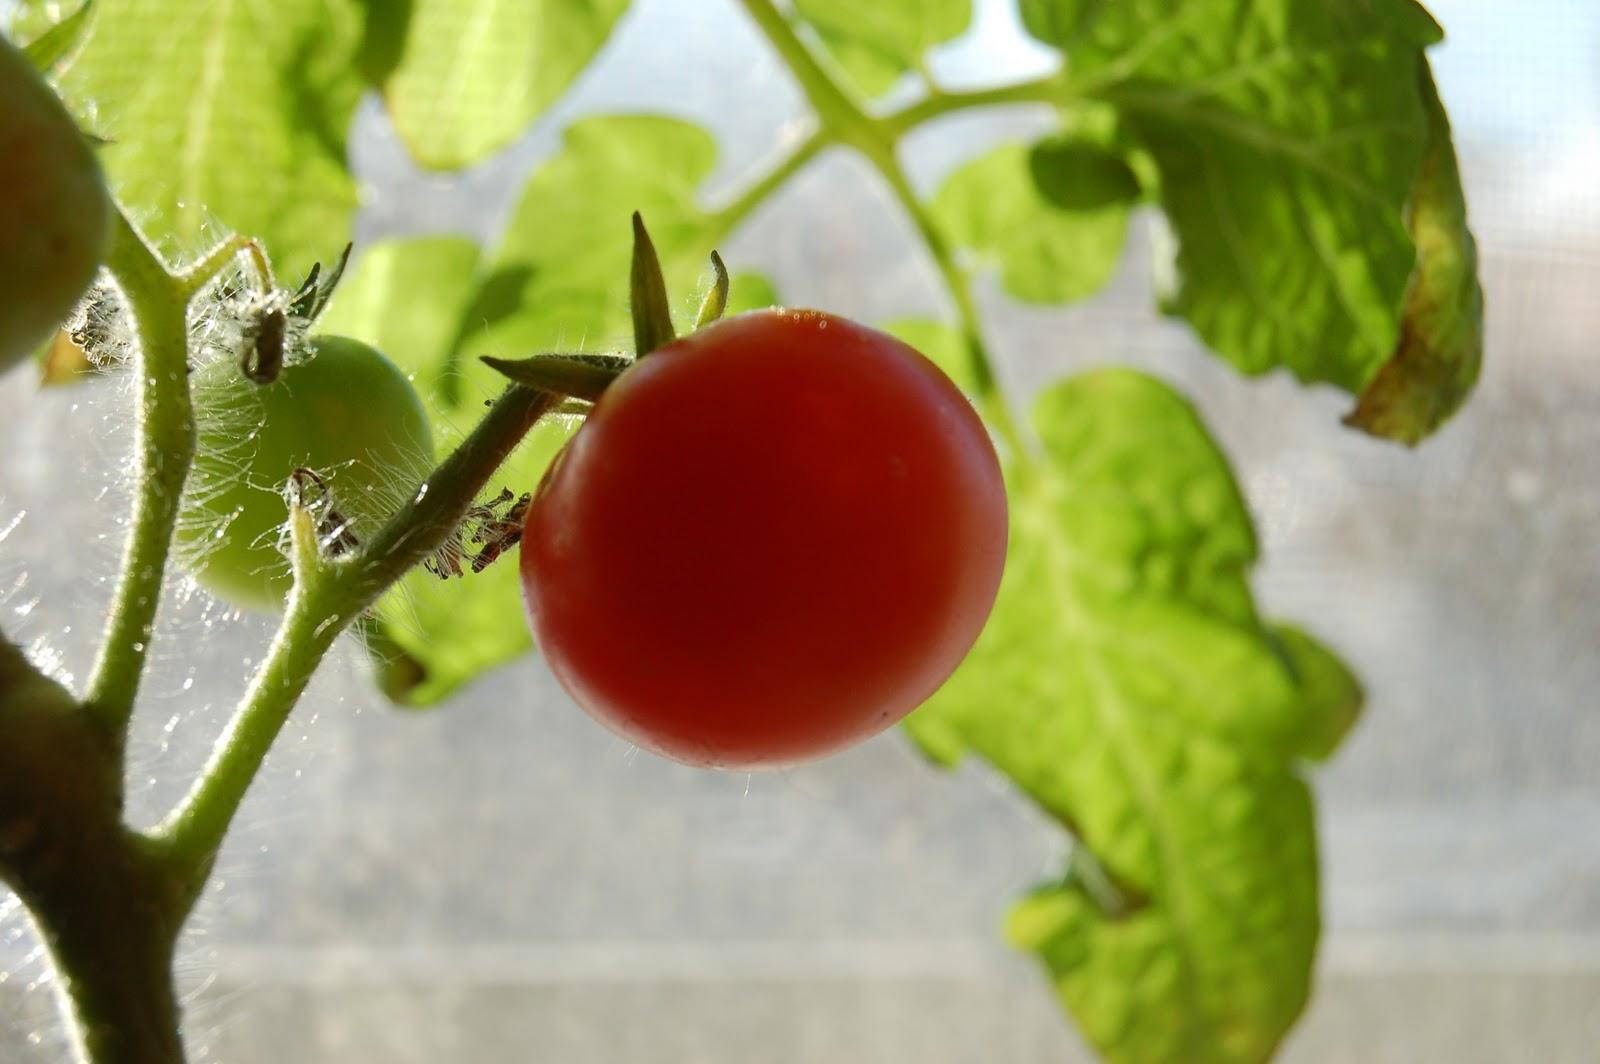 3 jardins au qu bec juillet 2013 - Plant de tomate cerise ...